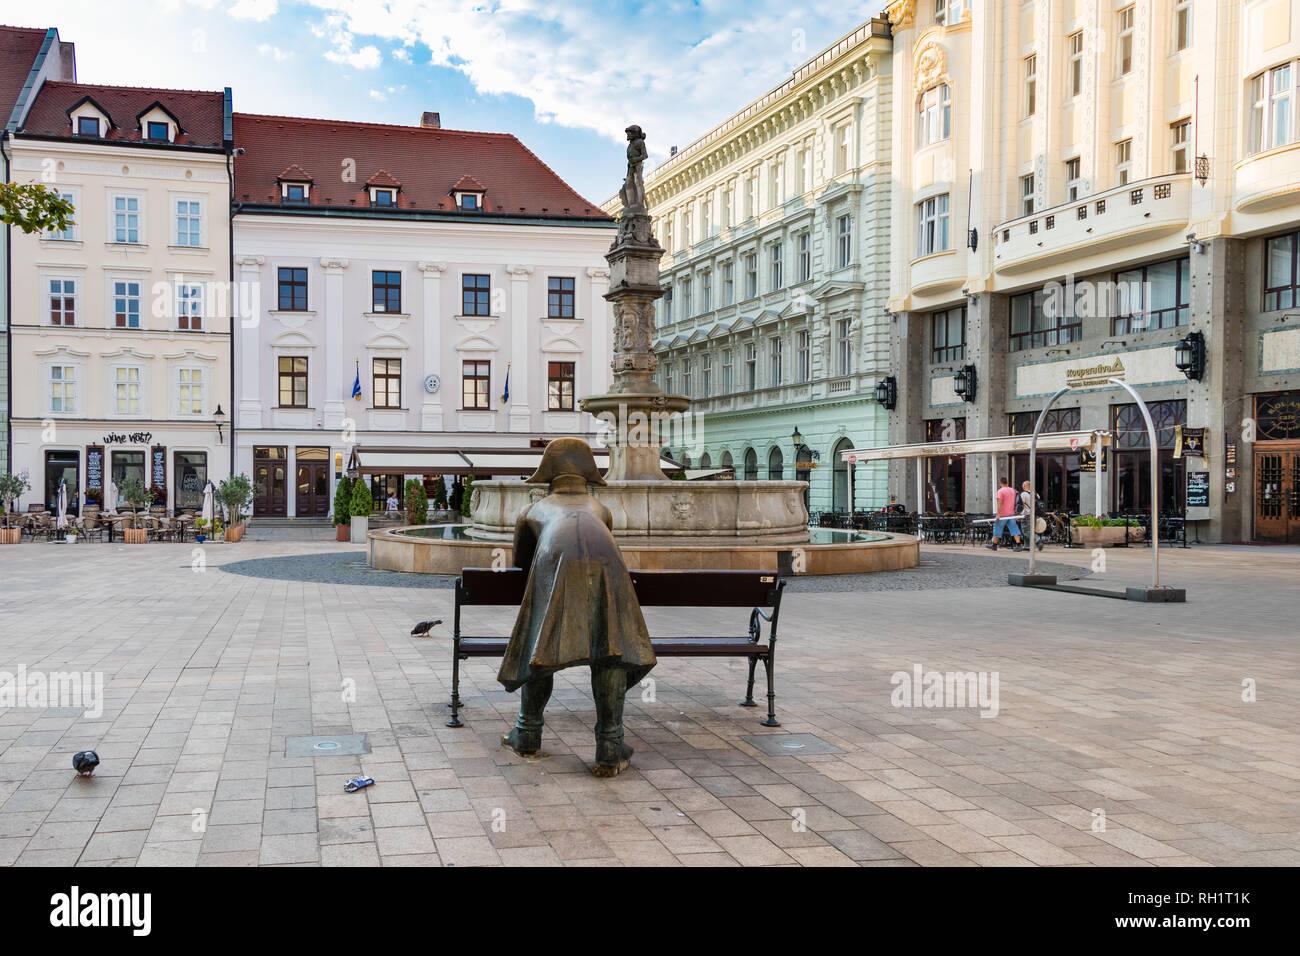 BRATISLAVA, Eslovaquia - 20 de agosto de 2018: la estatua de bronce de un soldado recostada sobre la plaza principal de Bratislava. Foto de stock